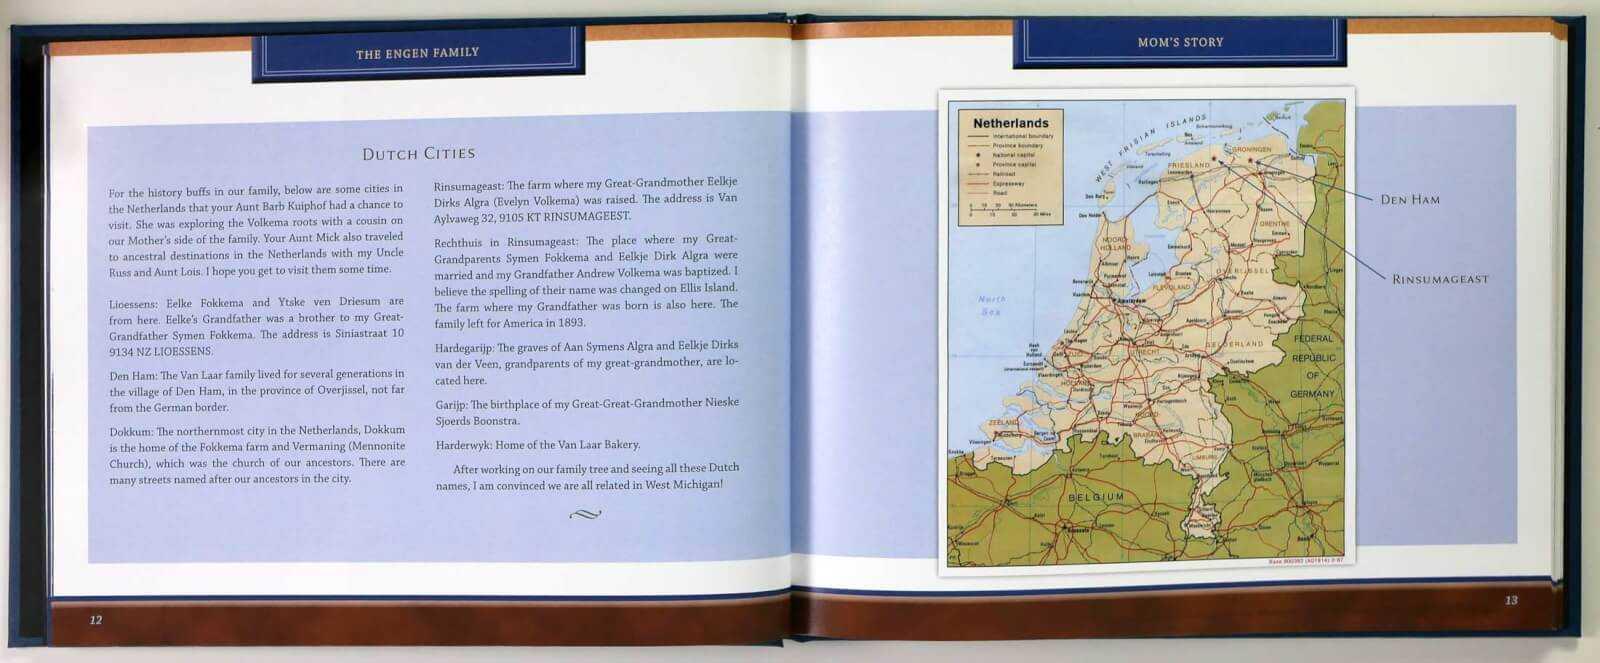 Engen life story - Netherlands Dutch legacy